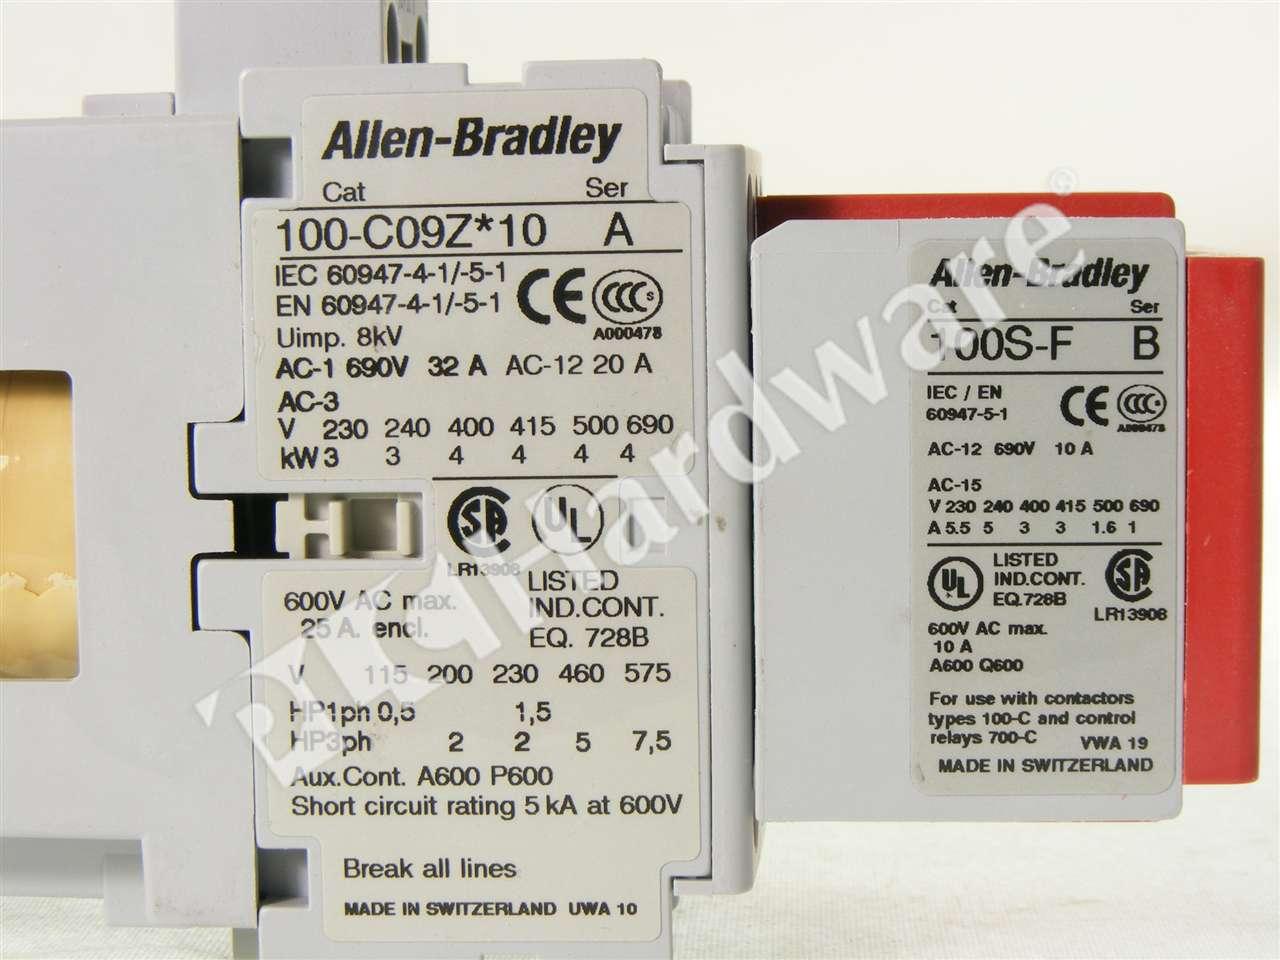 allen bradley parts catalog - HD1280×960